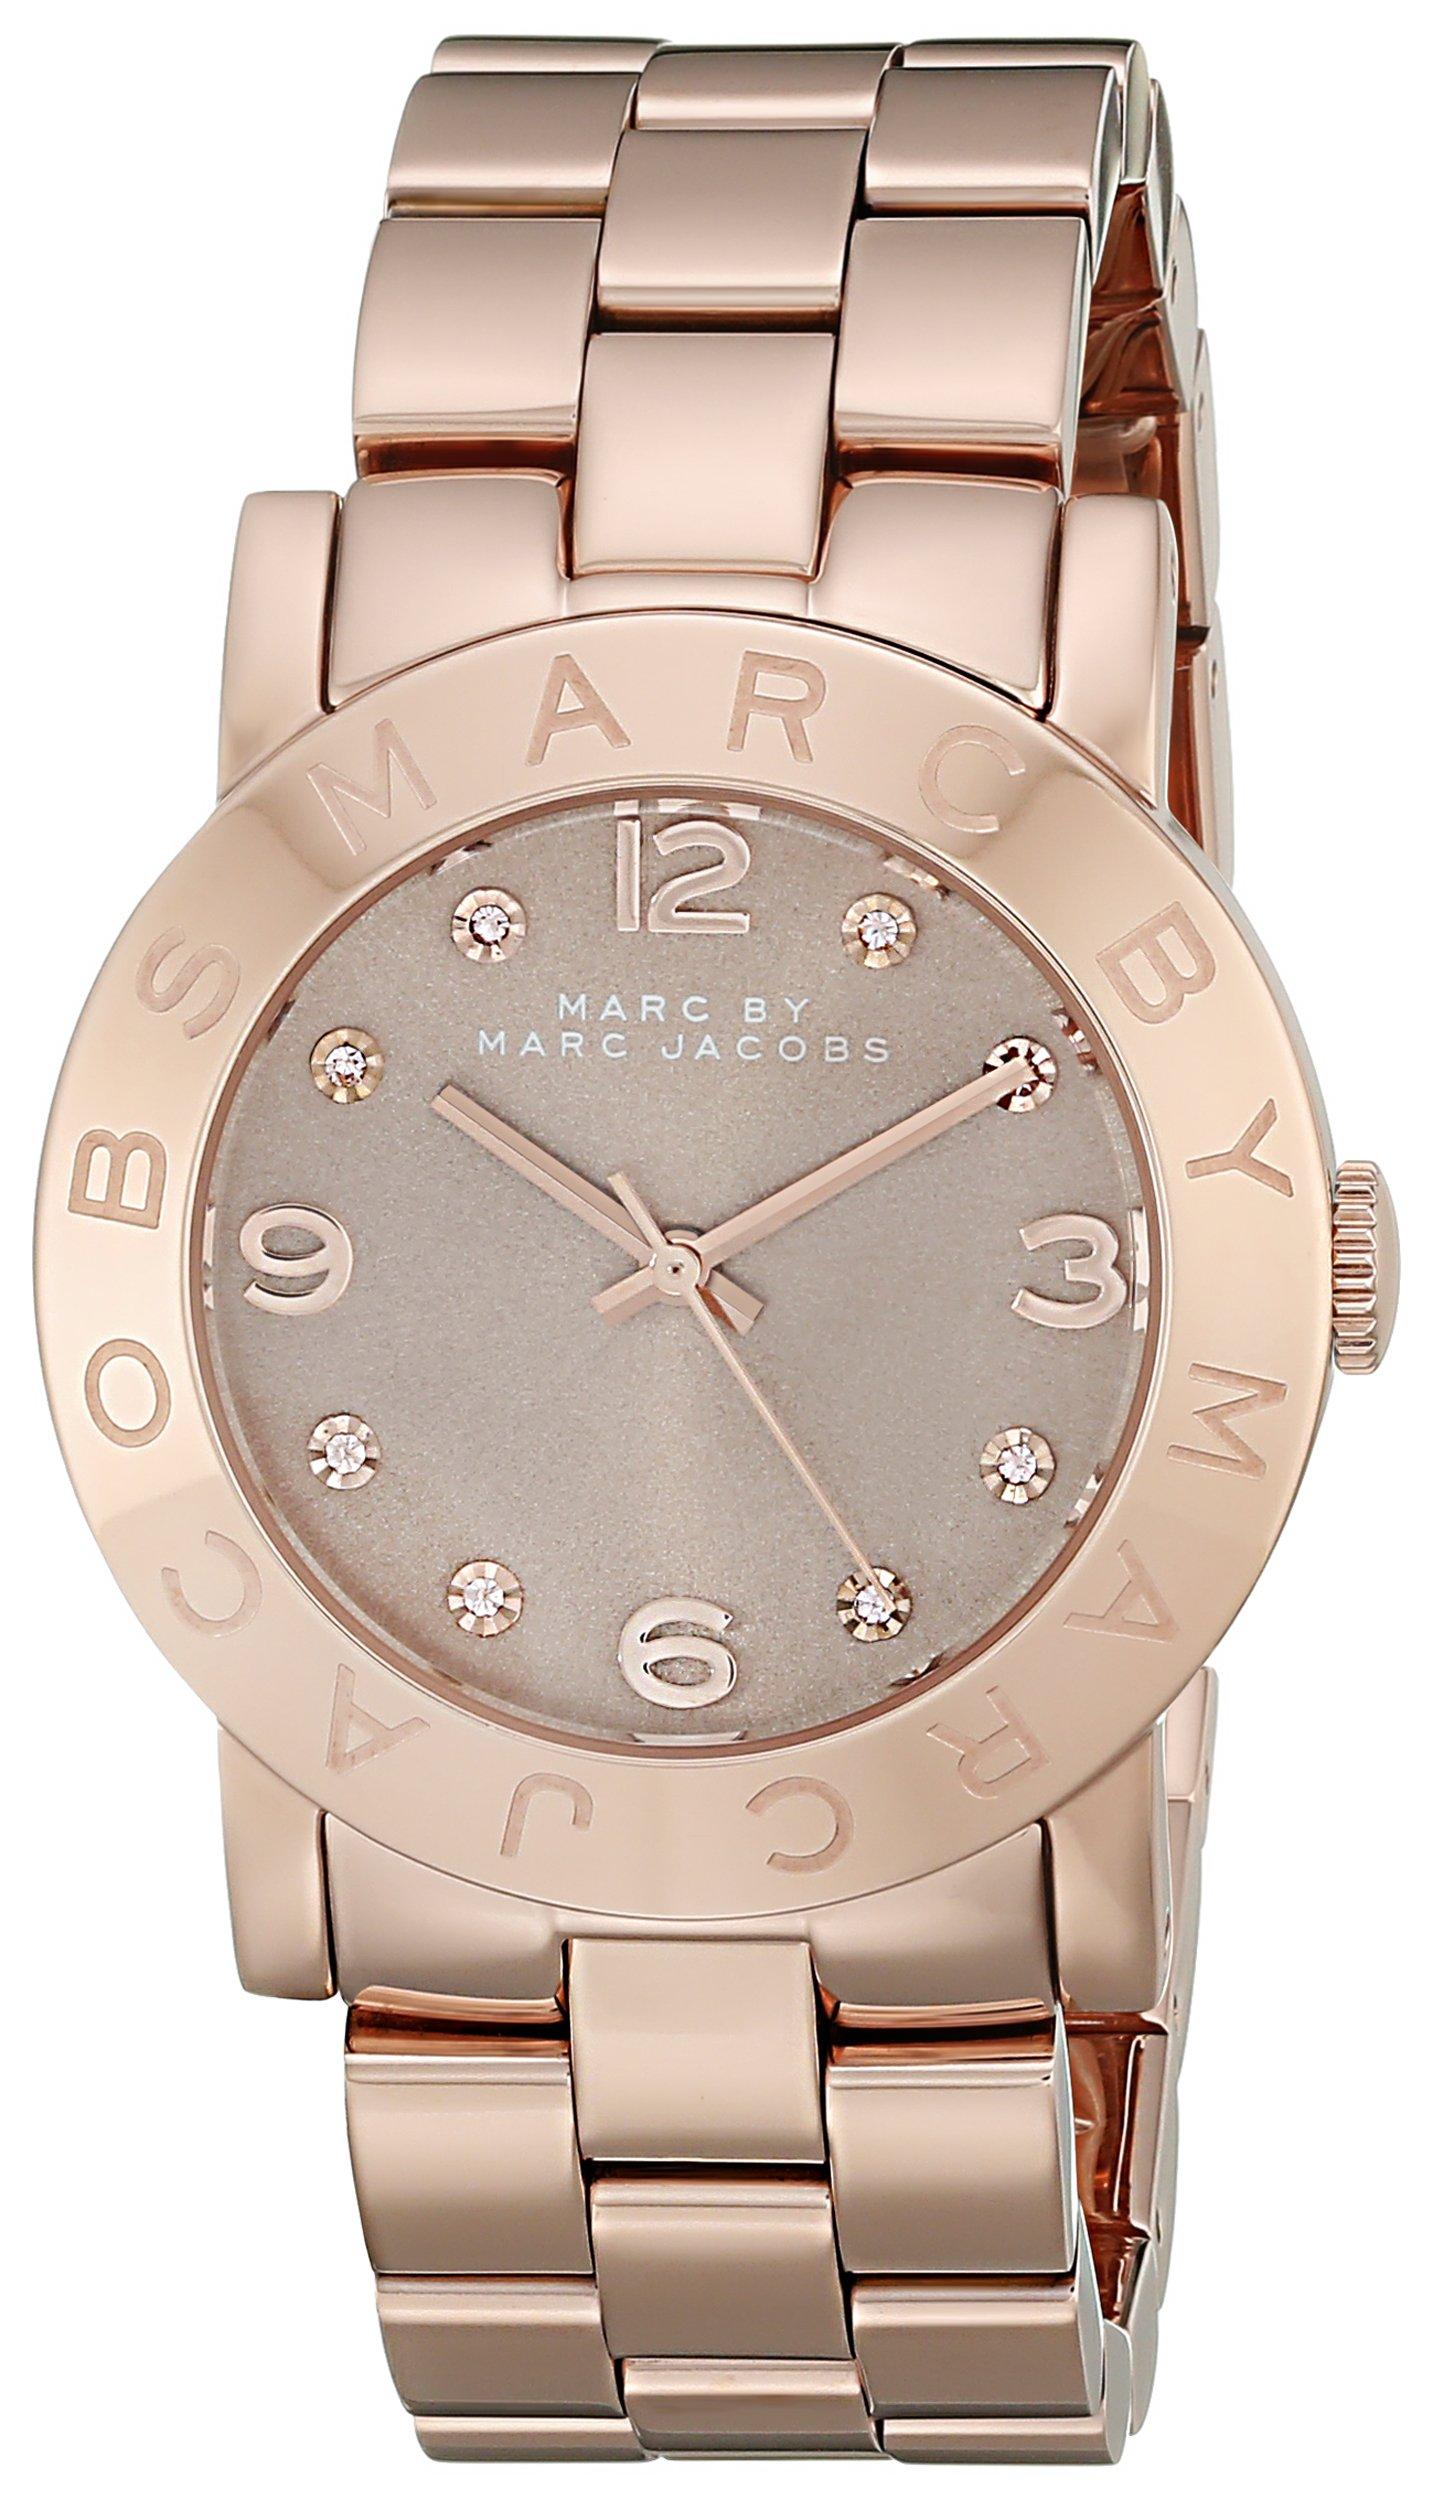 Marc by Marc Jacobs Women's MBM3221 Analog Display Analog Quartz Rose Gold Watch